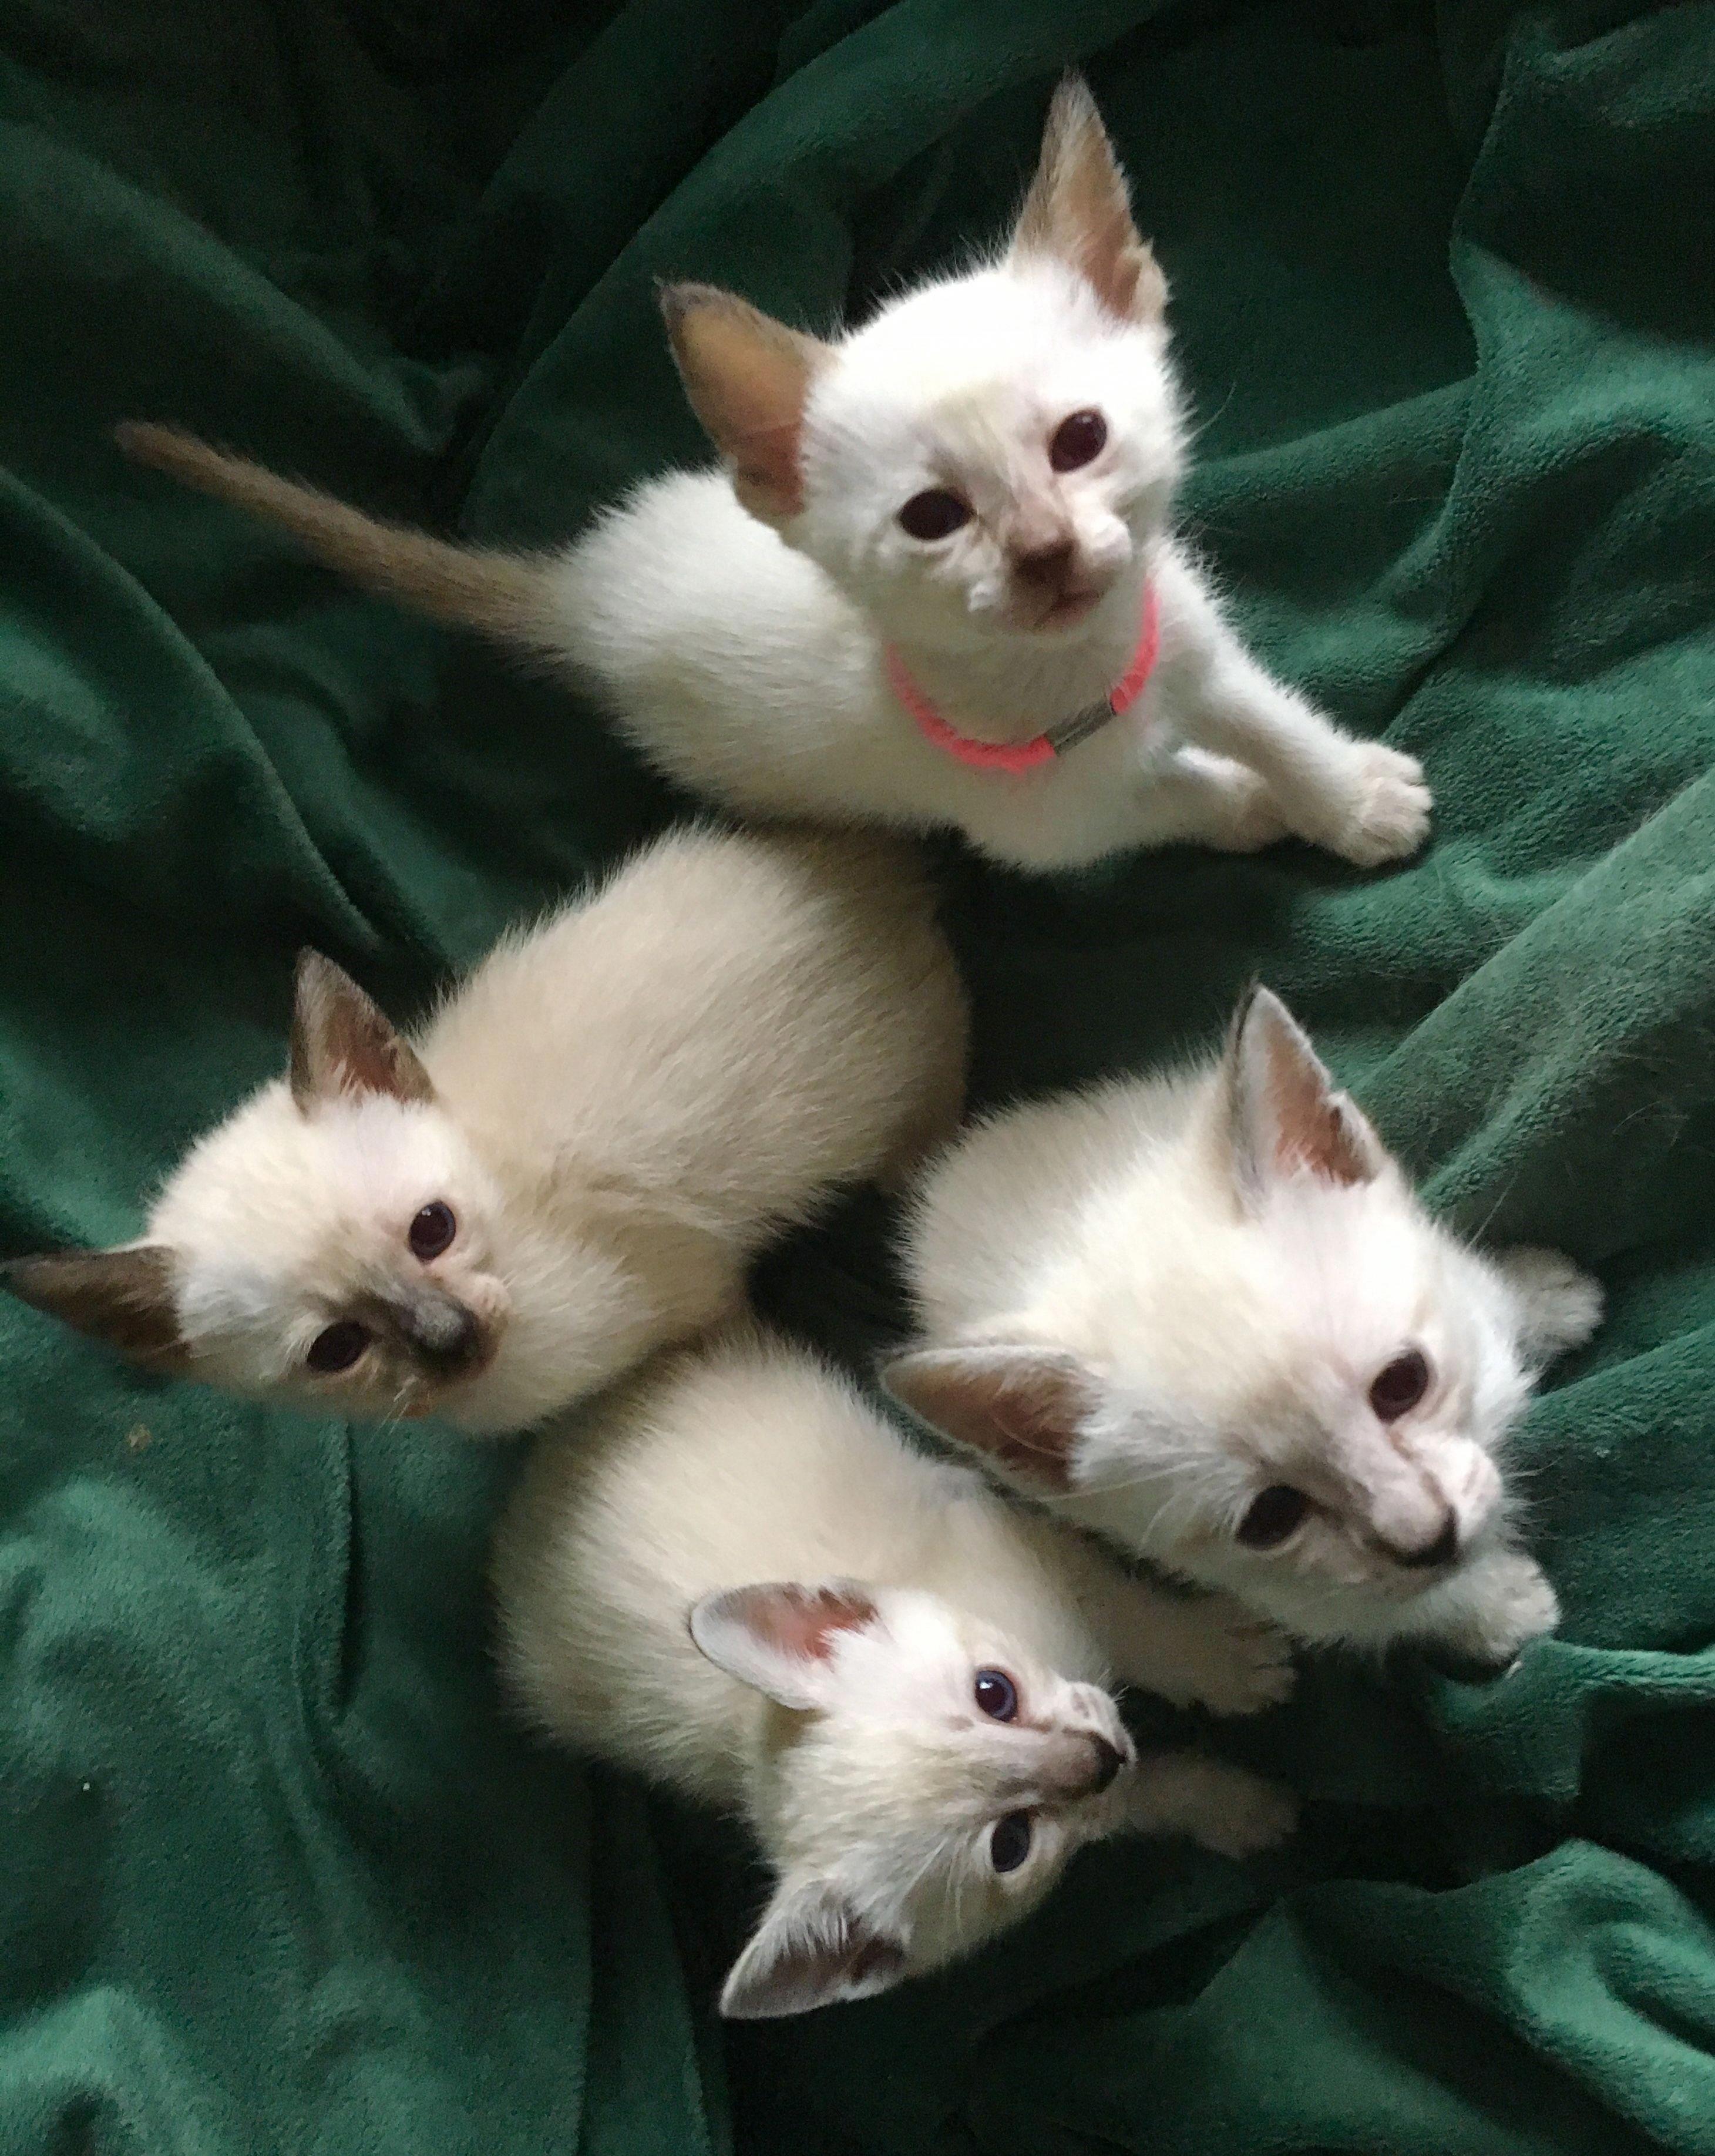 Cats For Free Near Me Catsarebetterthandogs Info 3765821776 Siamese Cats For Sale Cats For Sale Siamese Kittens